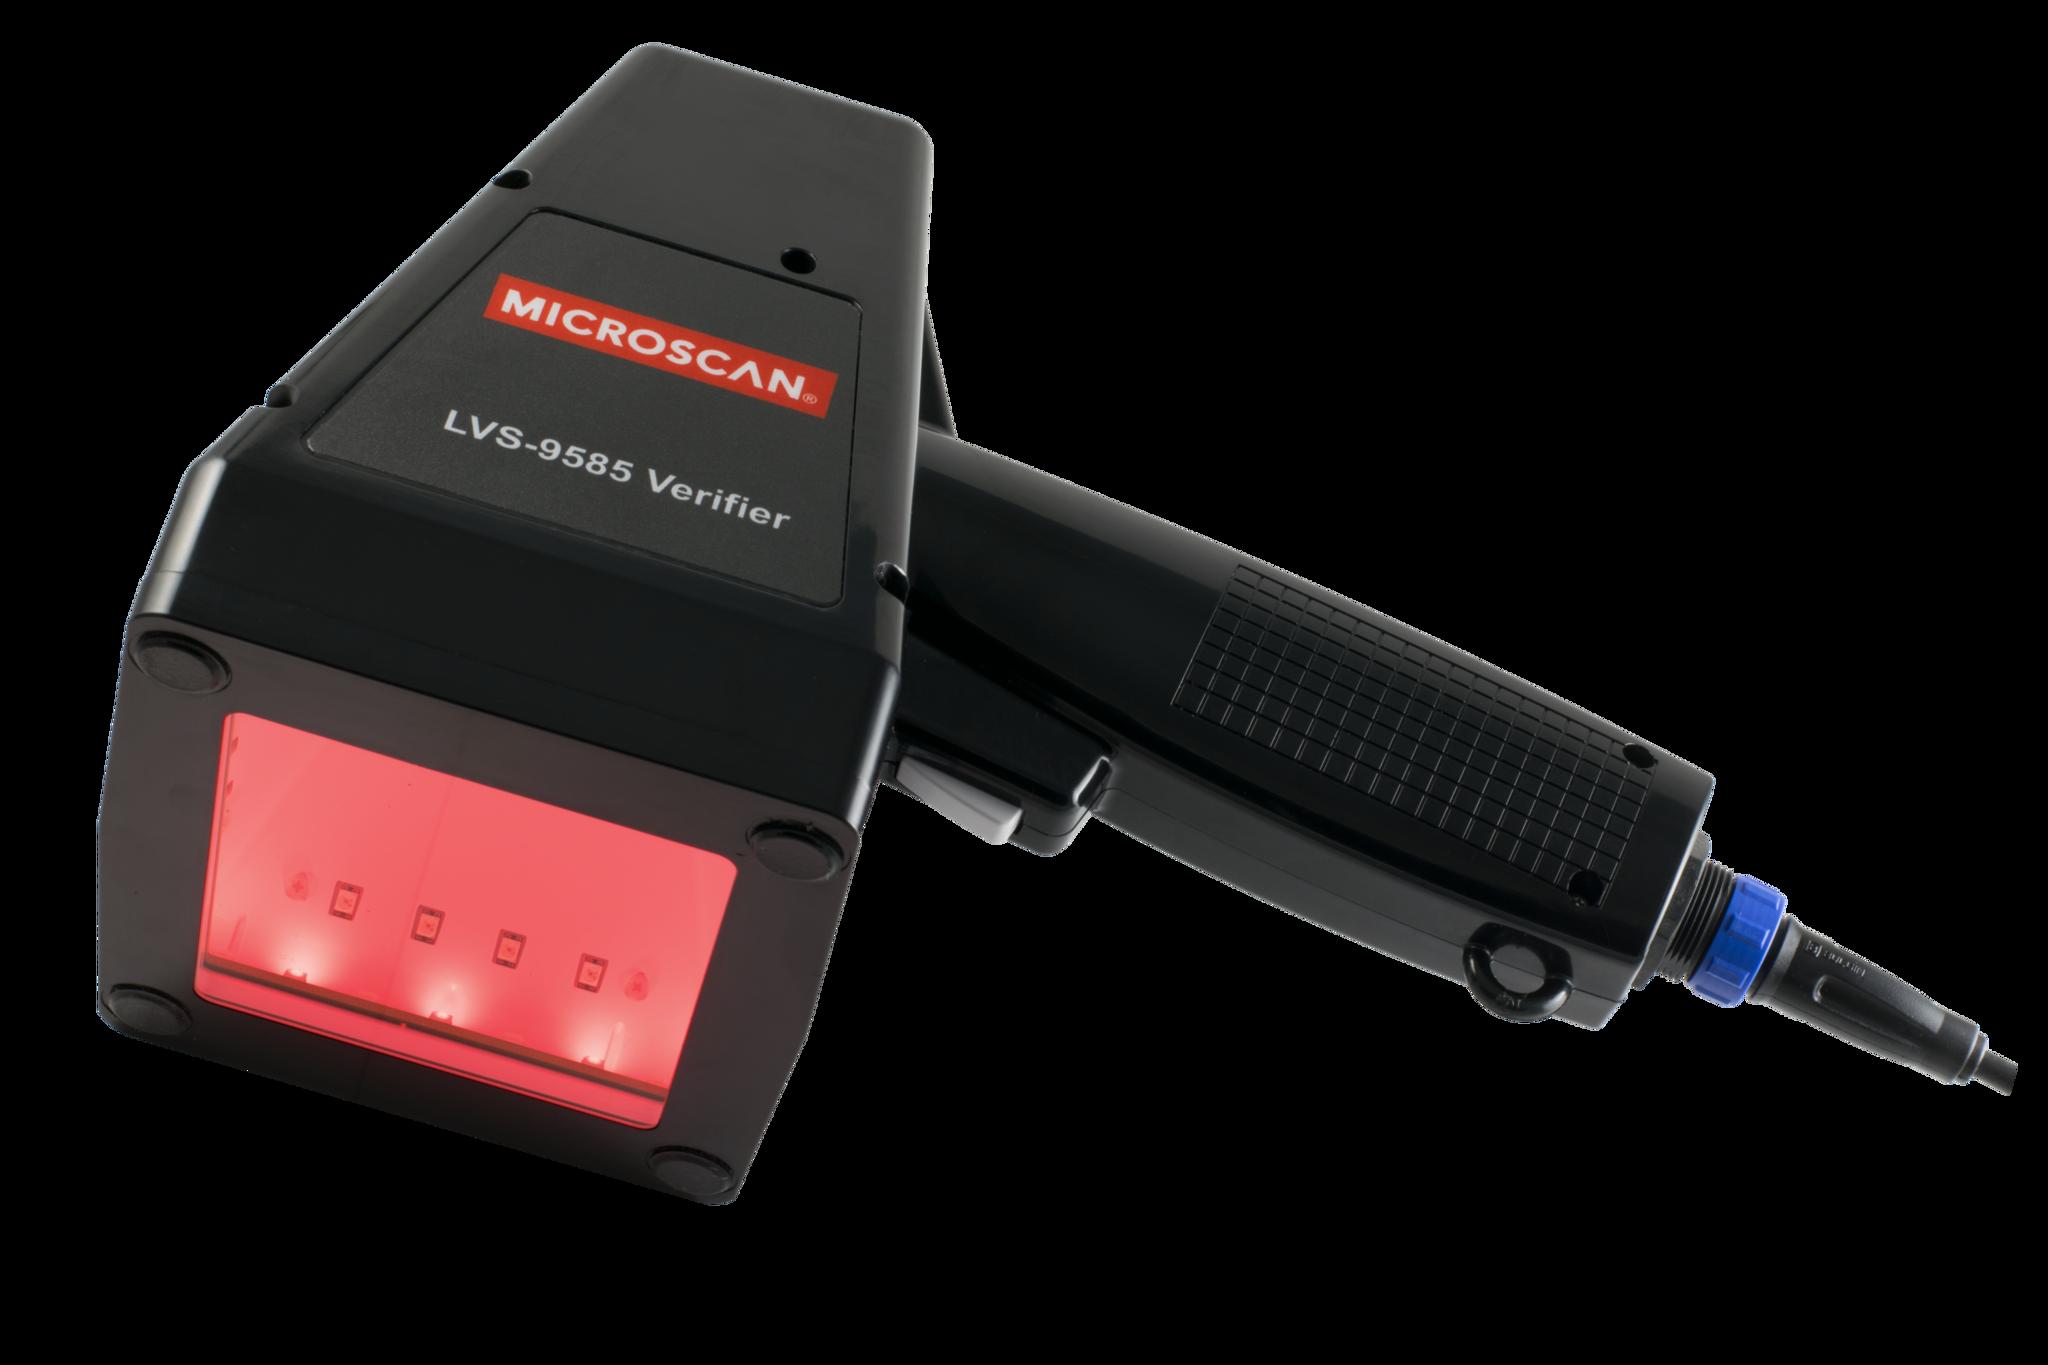 LVS-9585 Handheld-Barcode-Prüfgerät